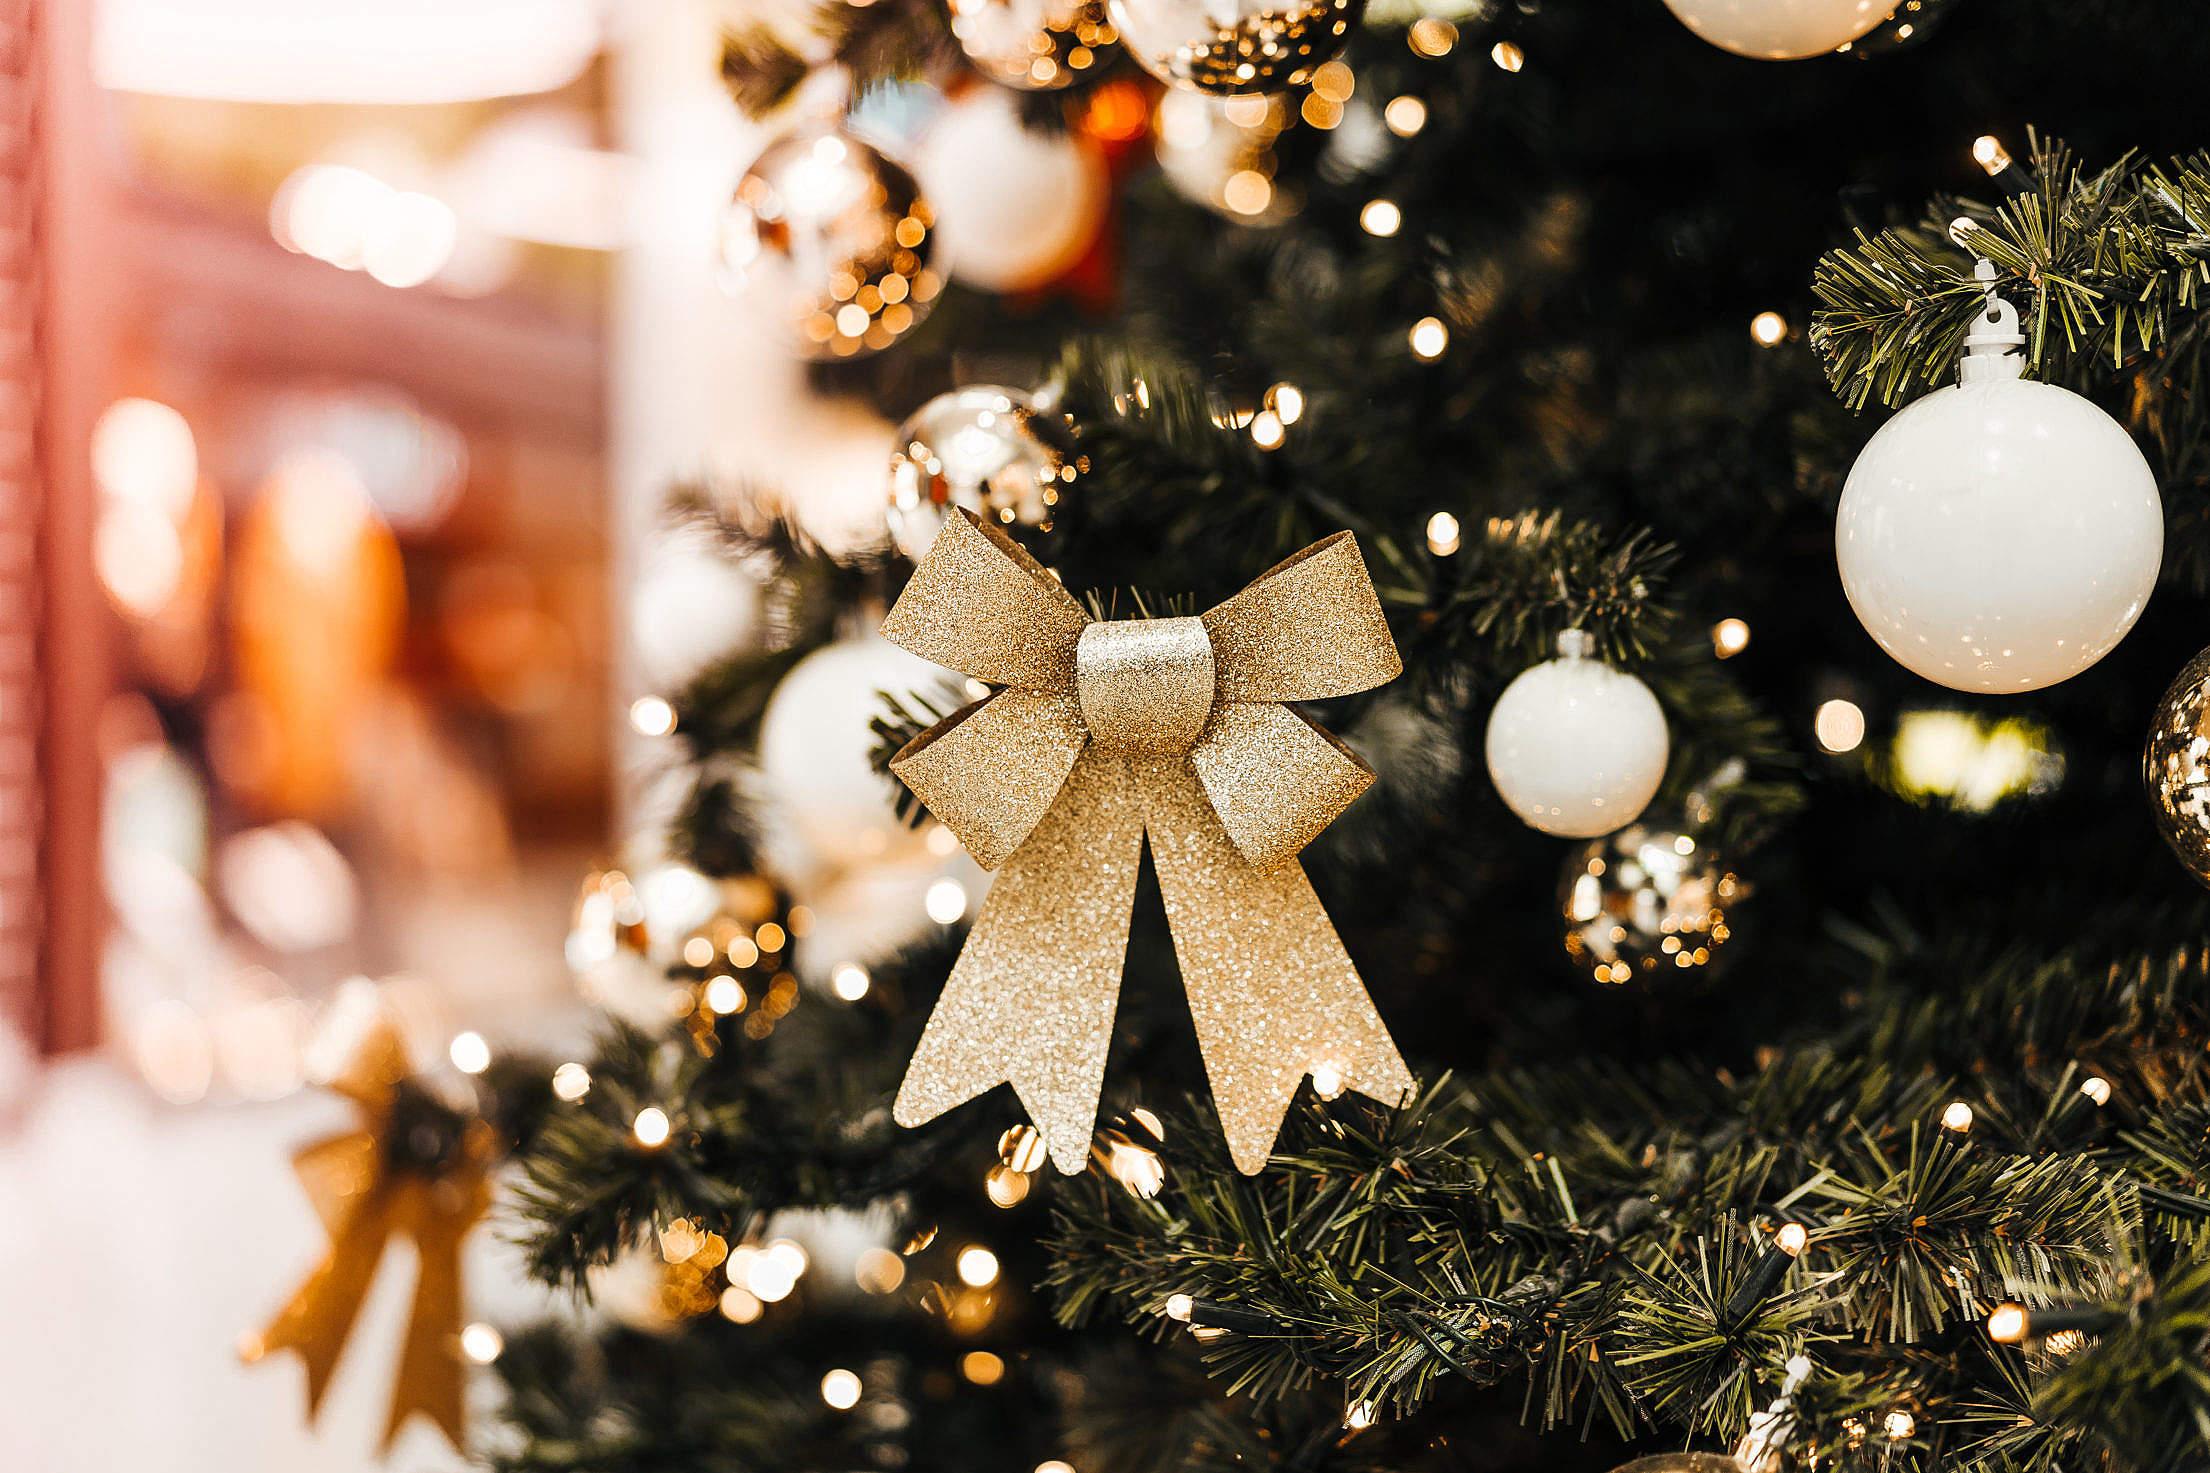 Christmas Tree Decoration Close Up Free Stock Photo